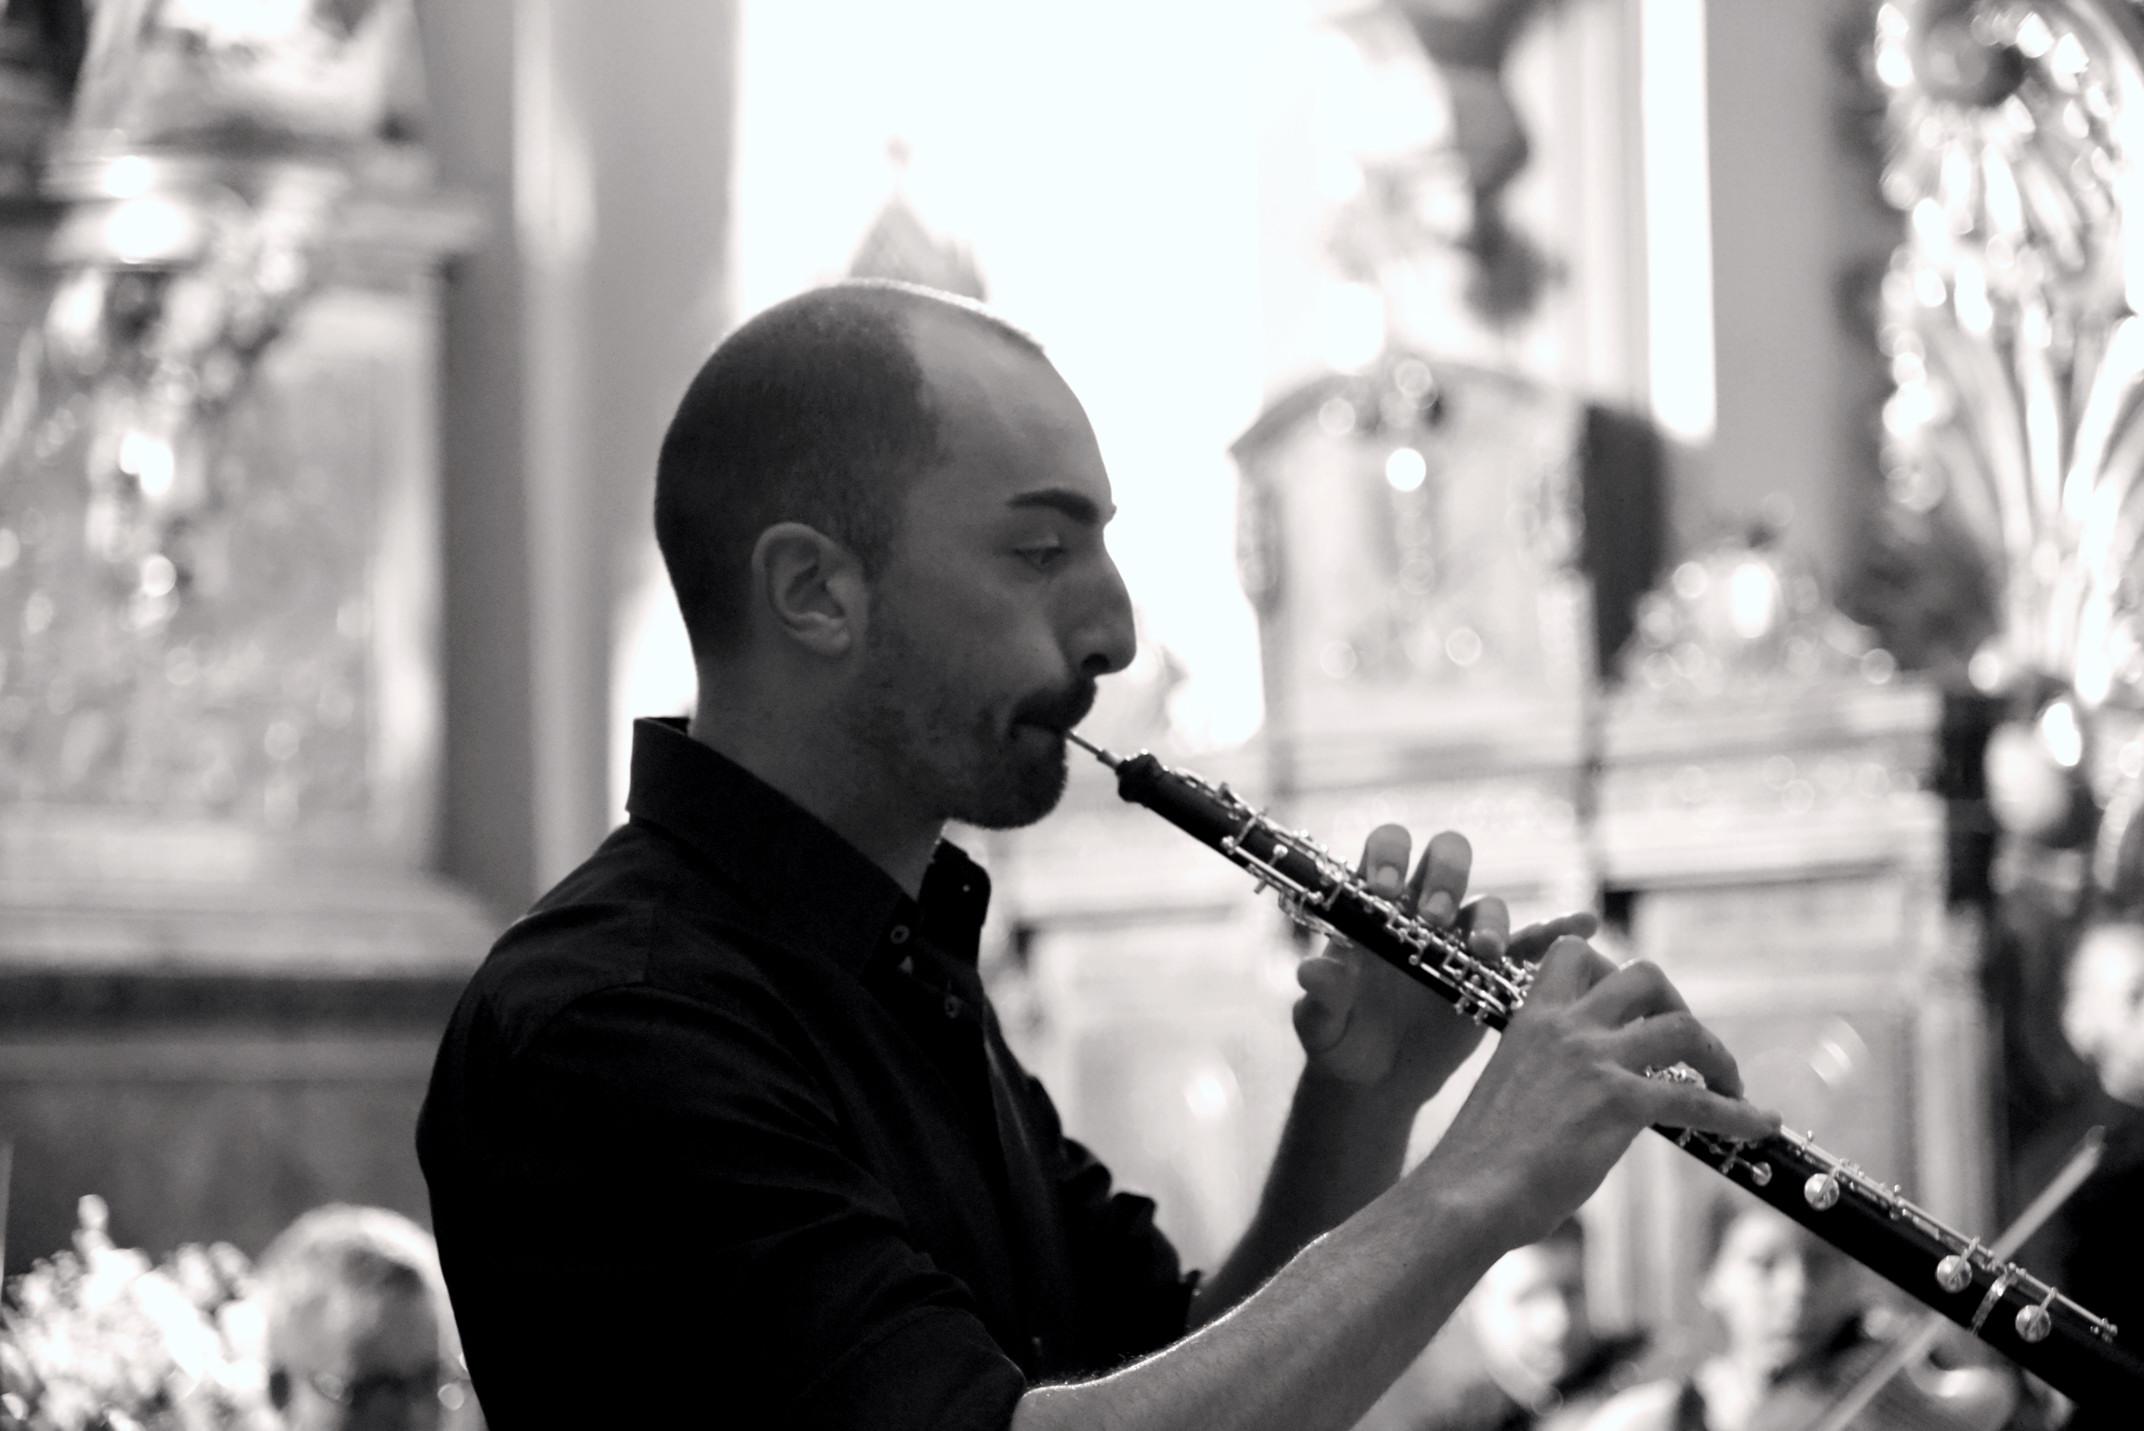 http://orquestatutti.com/wp/wp-content/uploads/2017/06/DSC_0235_06.jpg